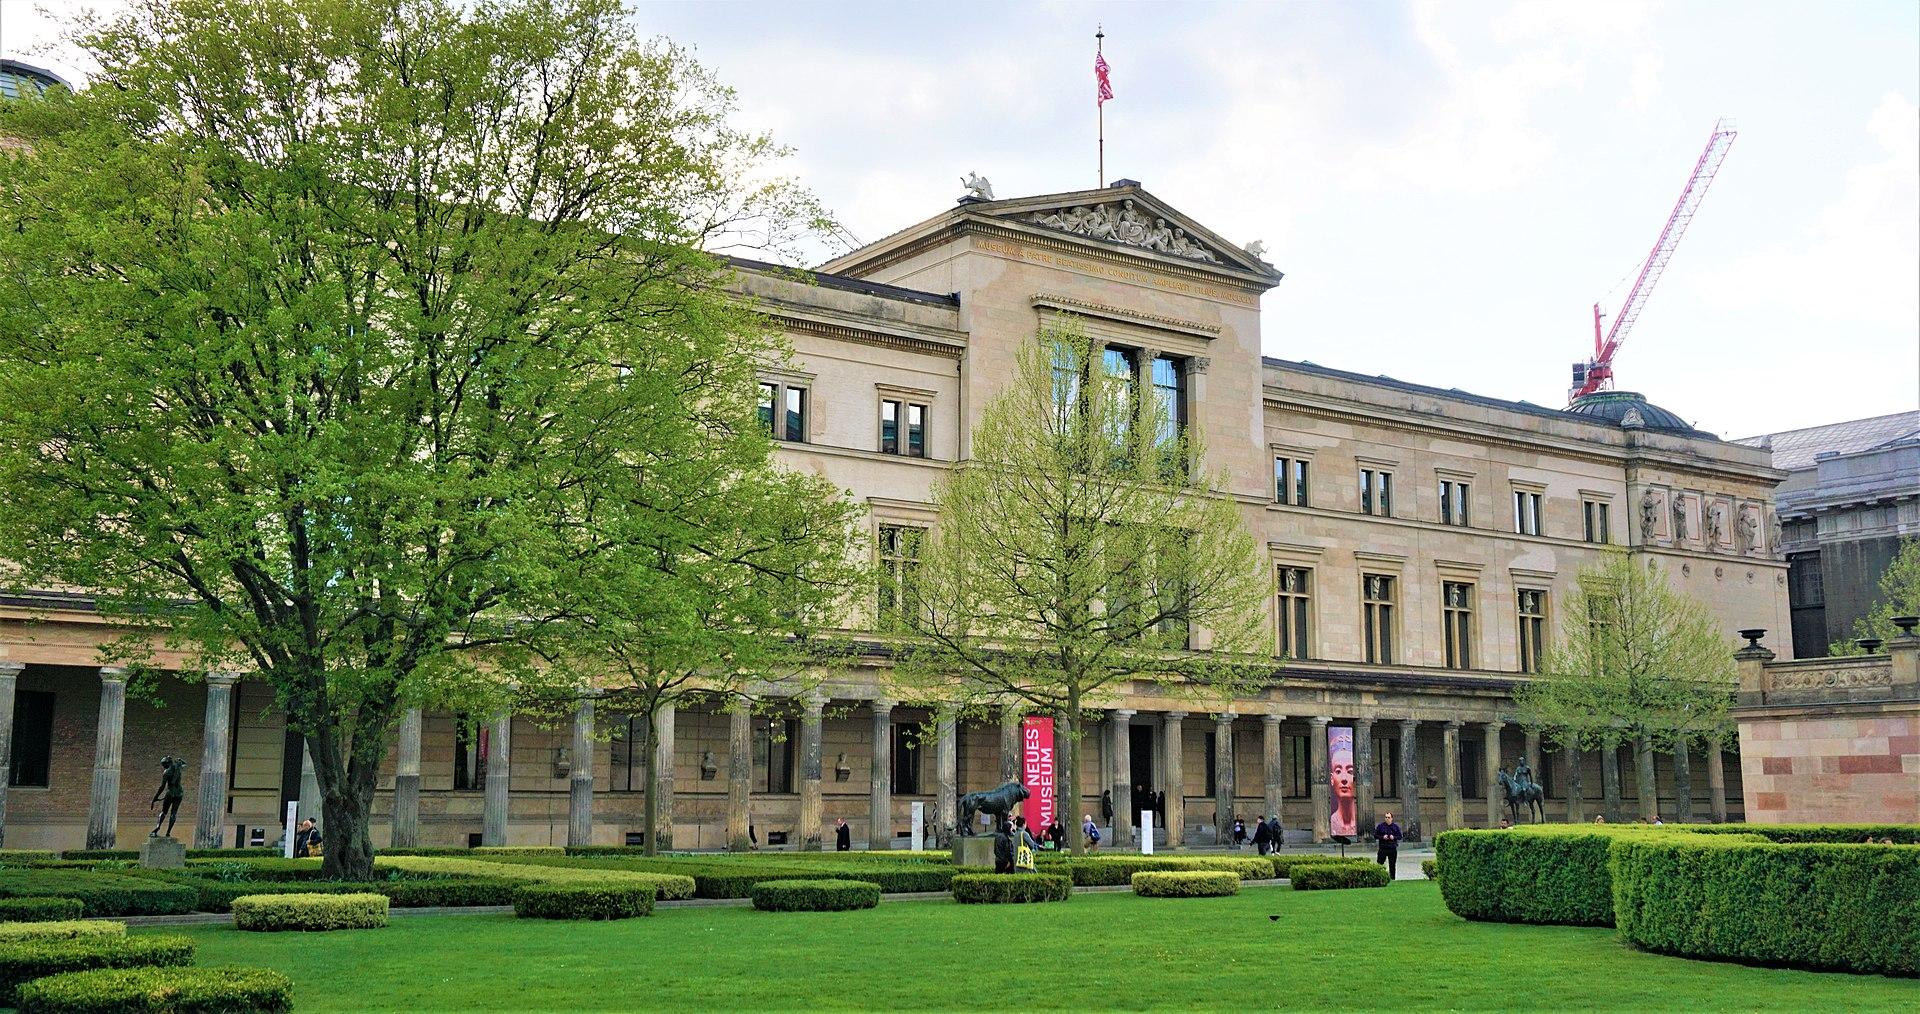 Neues Museum - Joy of Museums.jpg